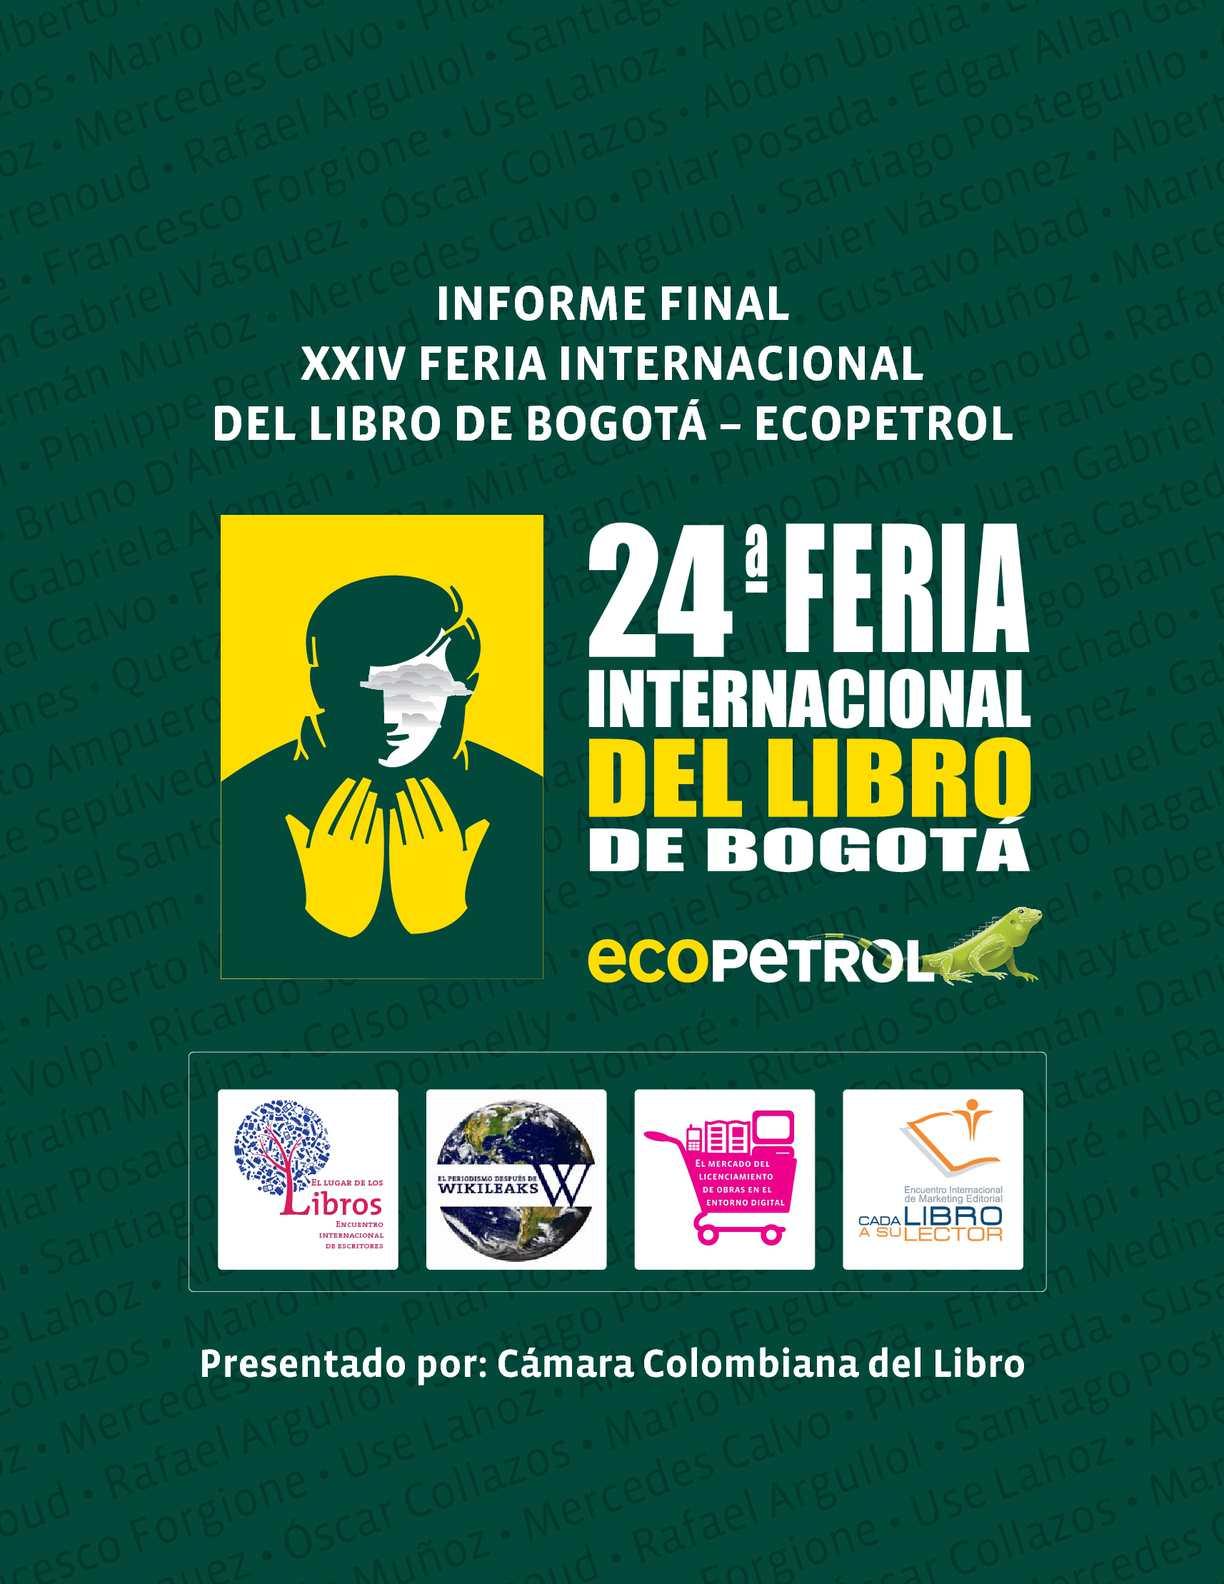 Calam O Informe De Resultados 24 Feria Internacional Del Libro  # Muebles Gema Bogota